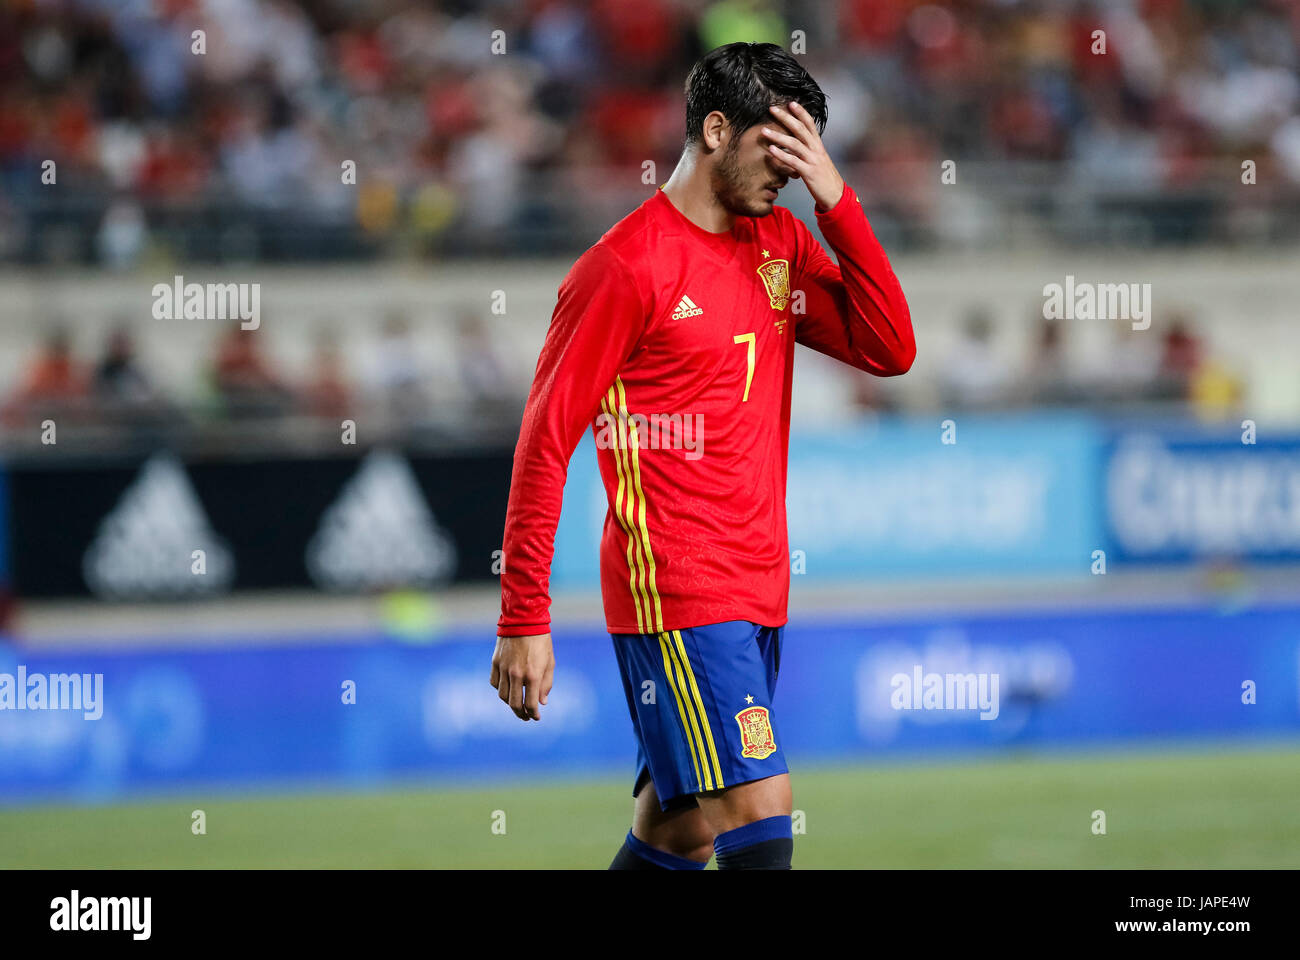 cee6c170c7f Spain National Football Team Stock Photos   Spain National Football ...